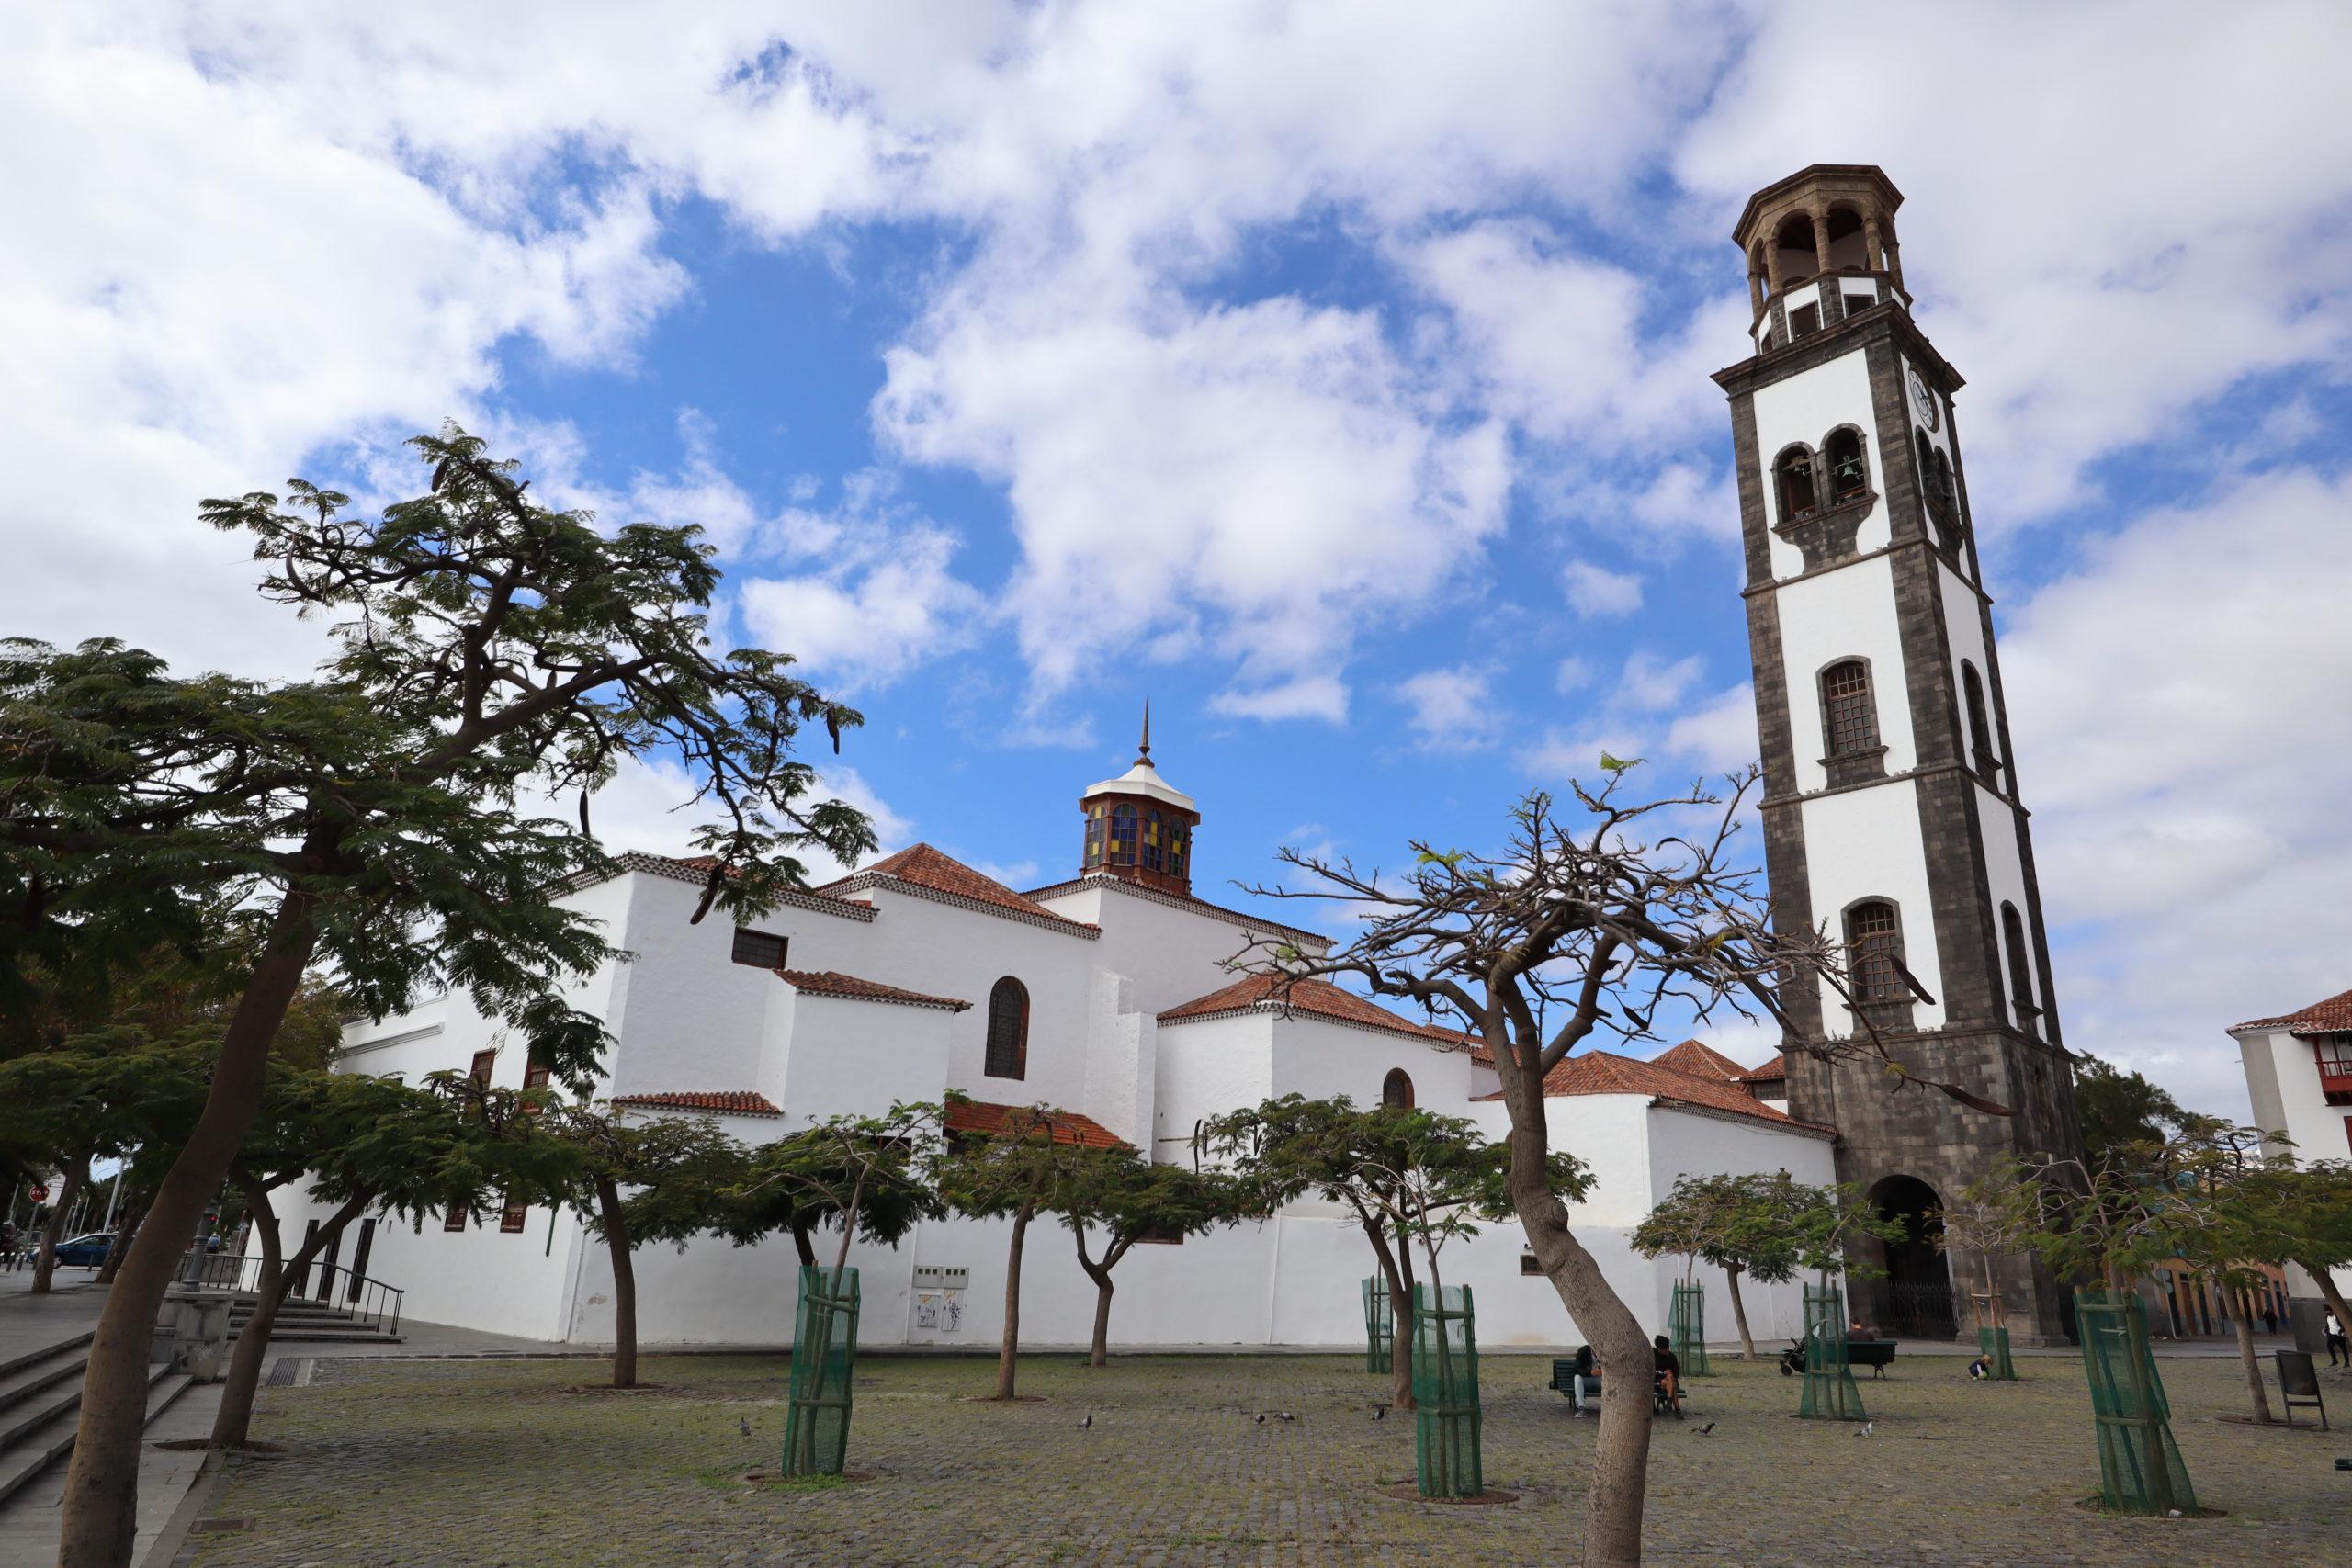 iglesia-concepcion-santa-cruz-tenerife